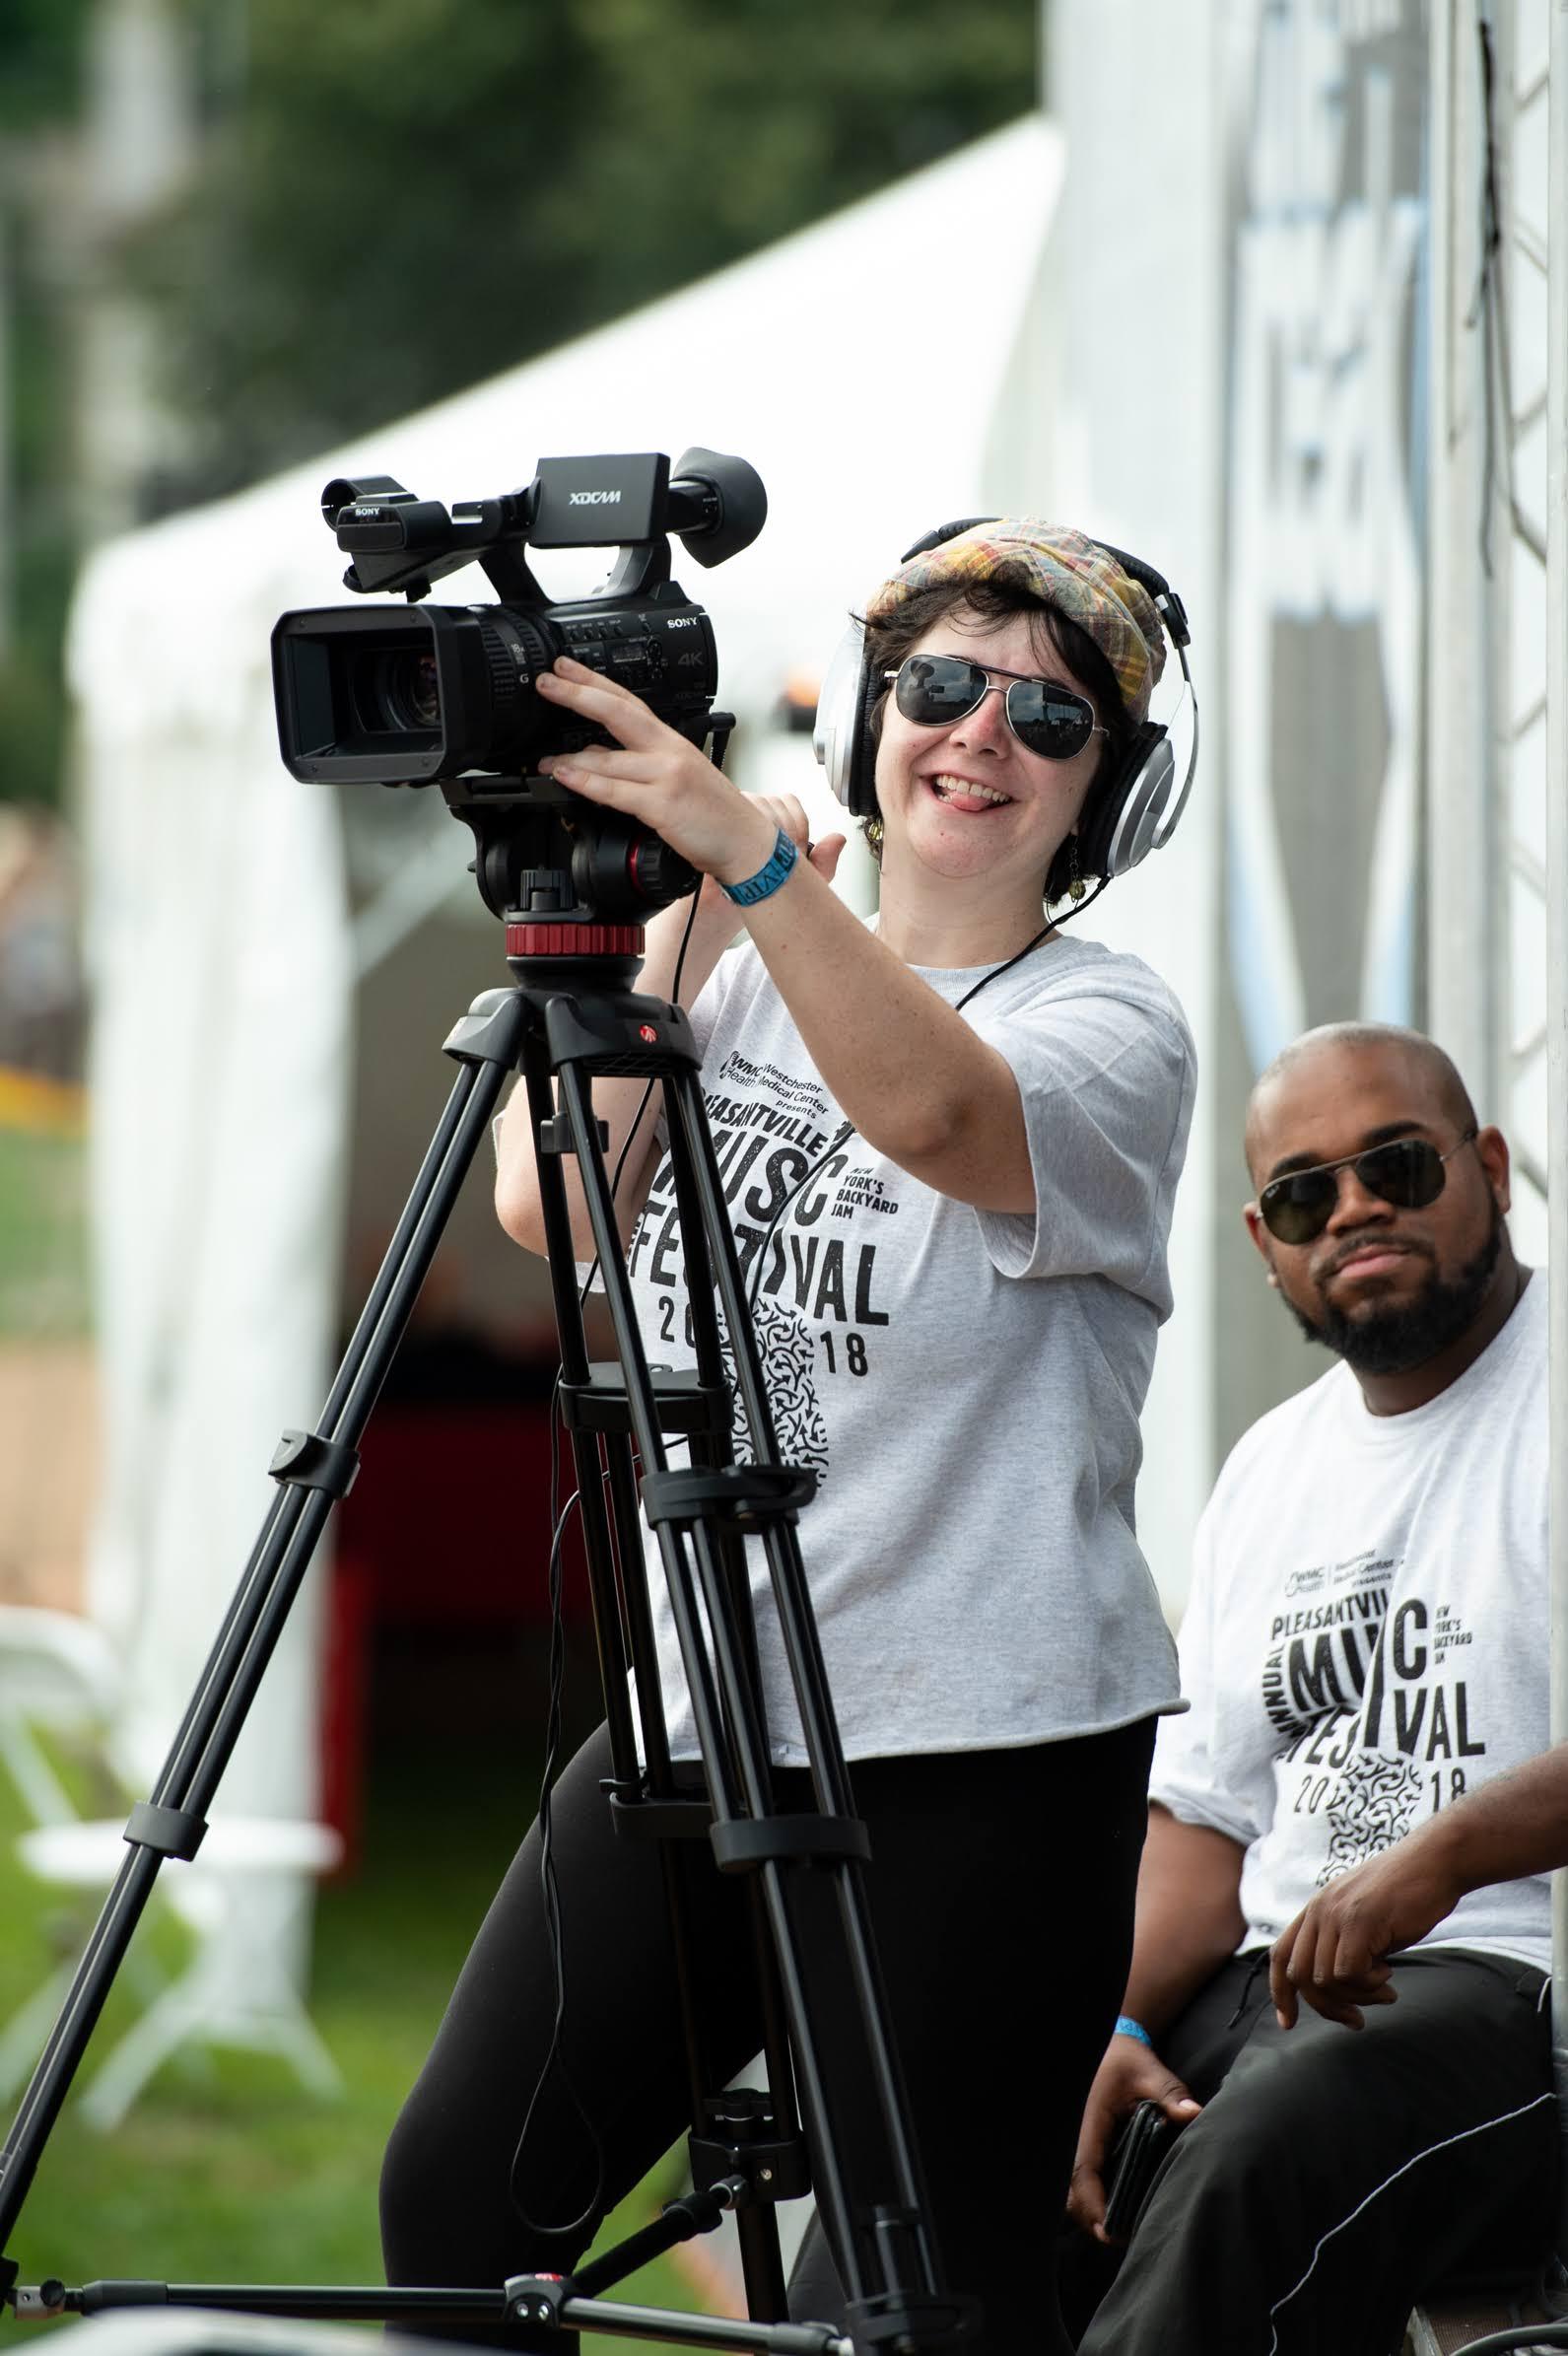 Olivia Nemec capturing the video for PCTV © 2018 Lynda Shenkman